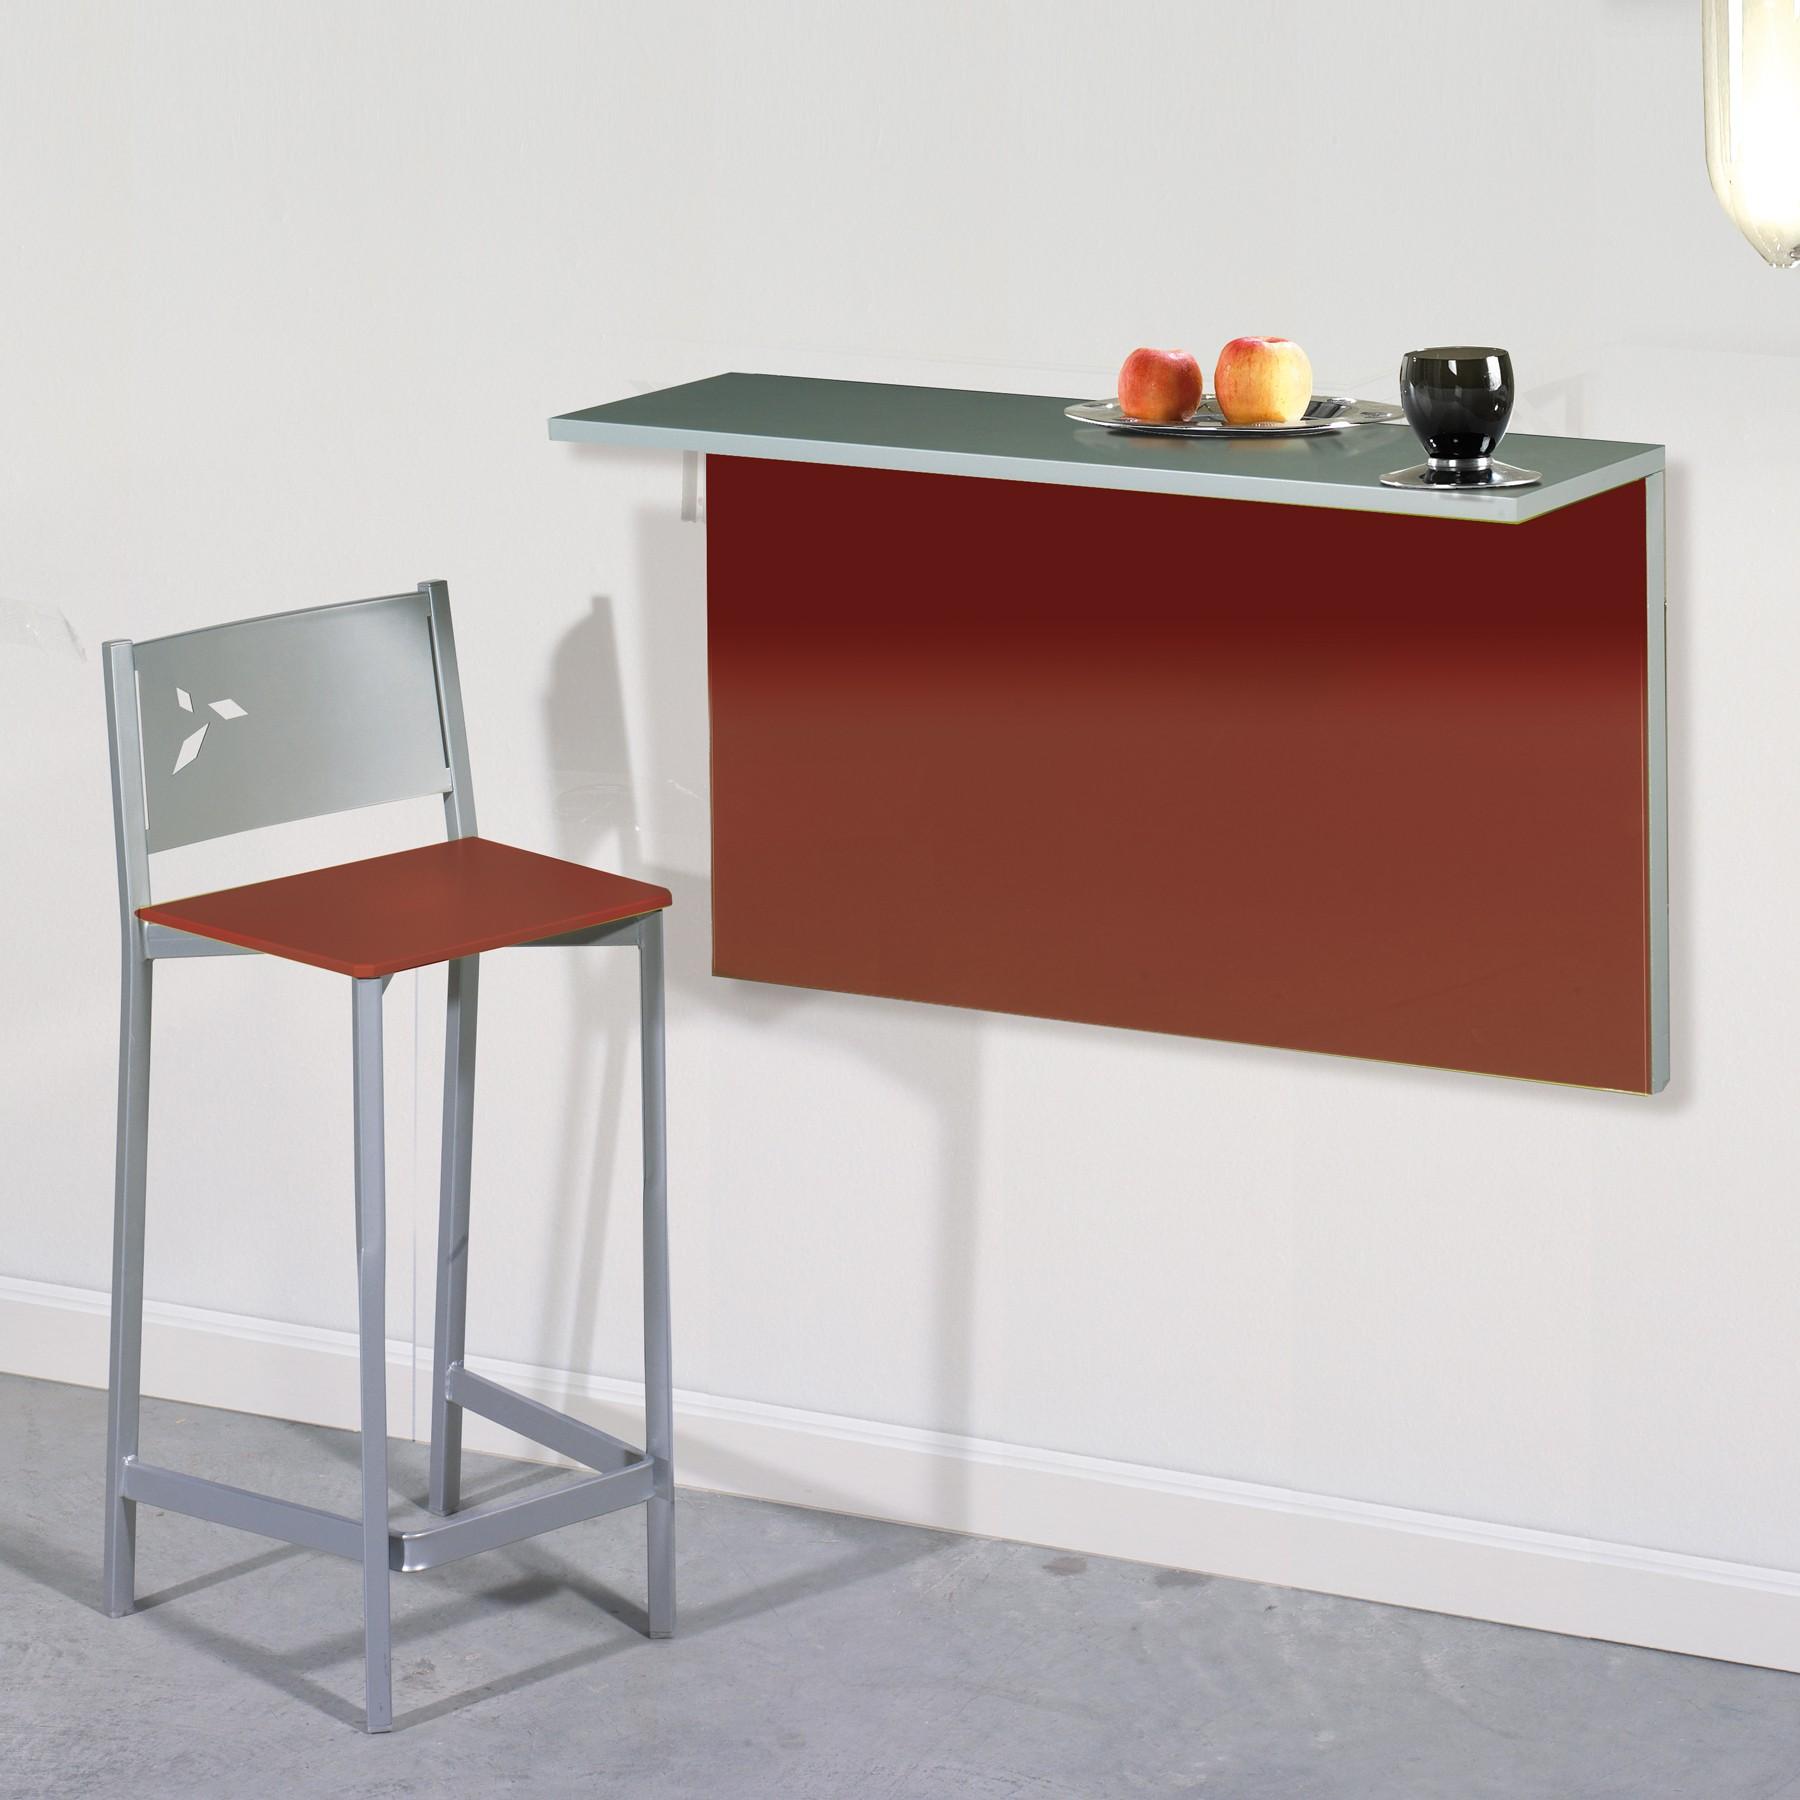 Pack ahorro en mesa de cocina de pared con dos taburetes for Mesa abatible cocina